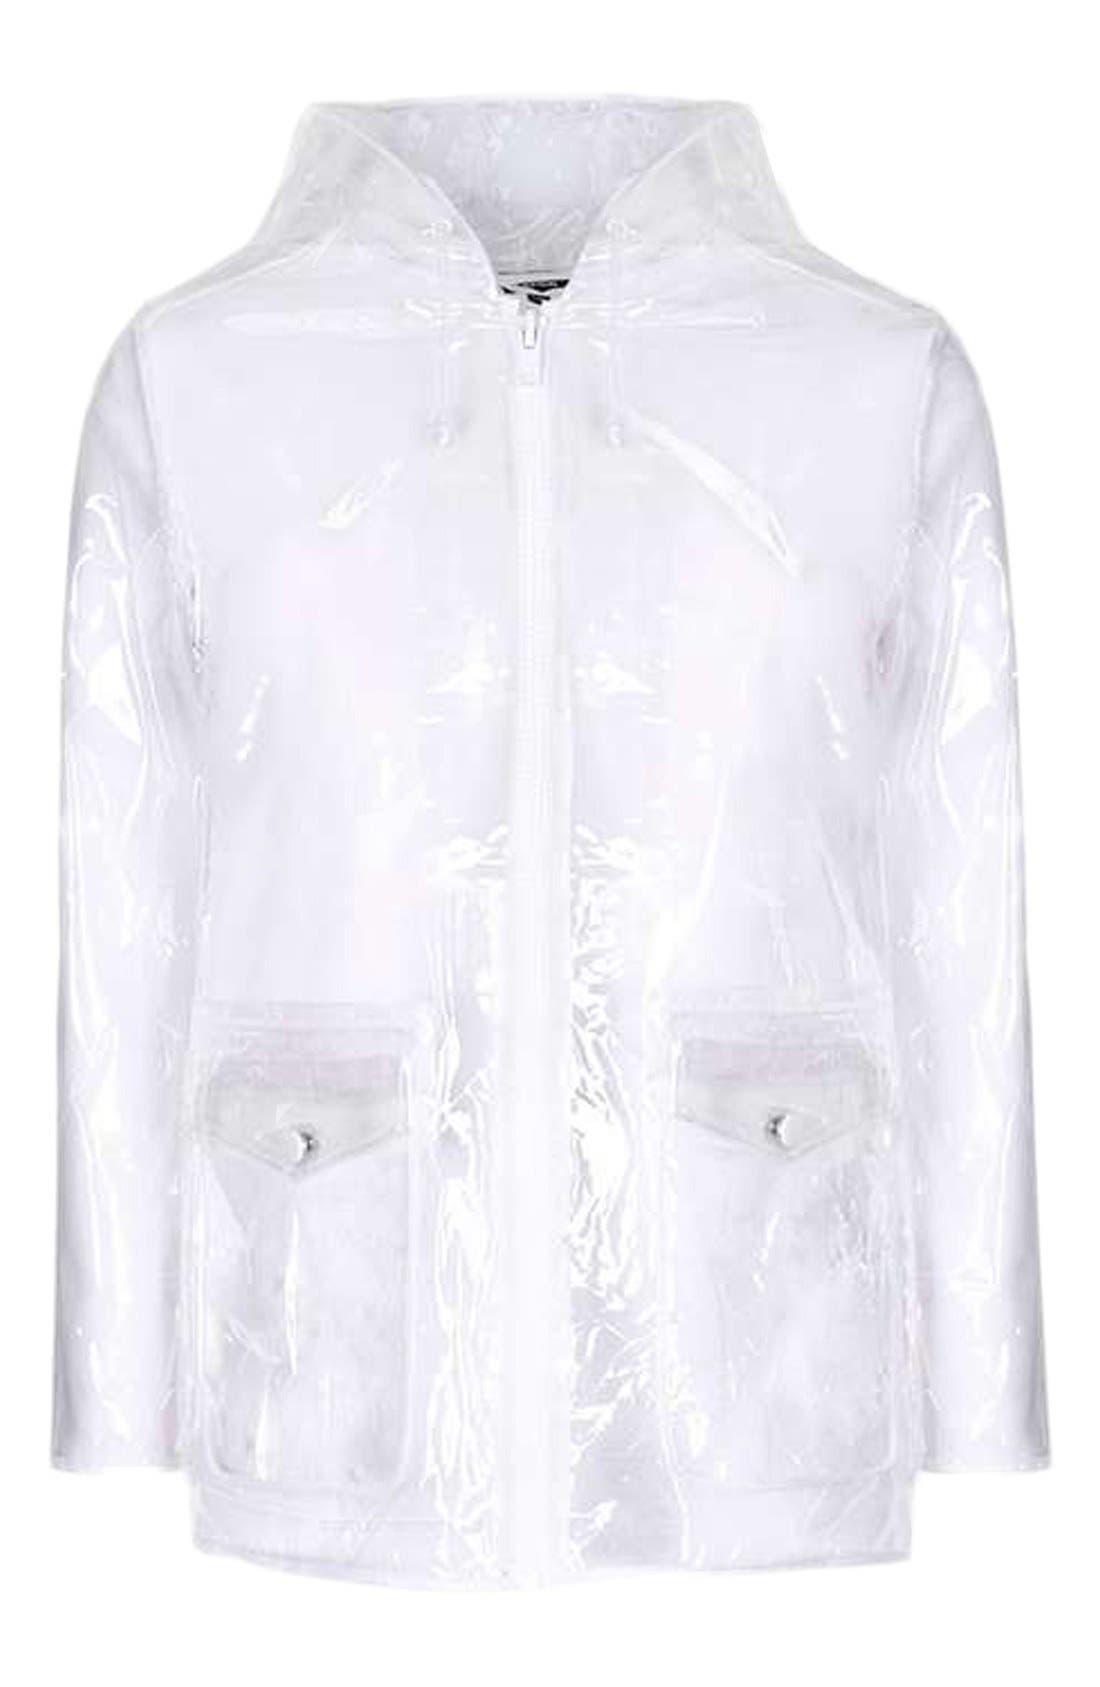 Clear Plastic Rain Jacket,                             Alternate thumbnail 5, color,                             000